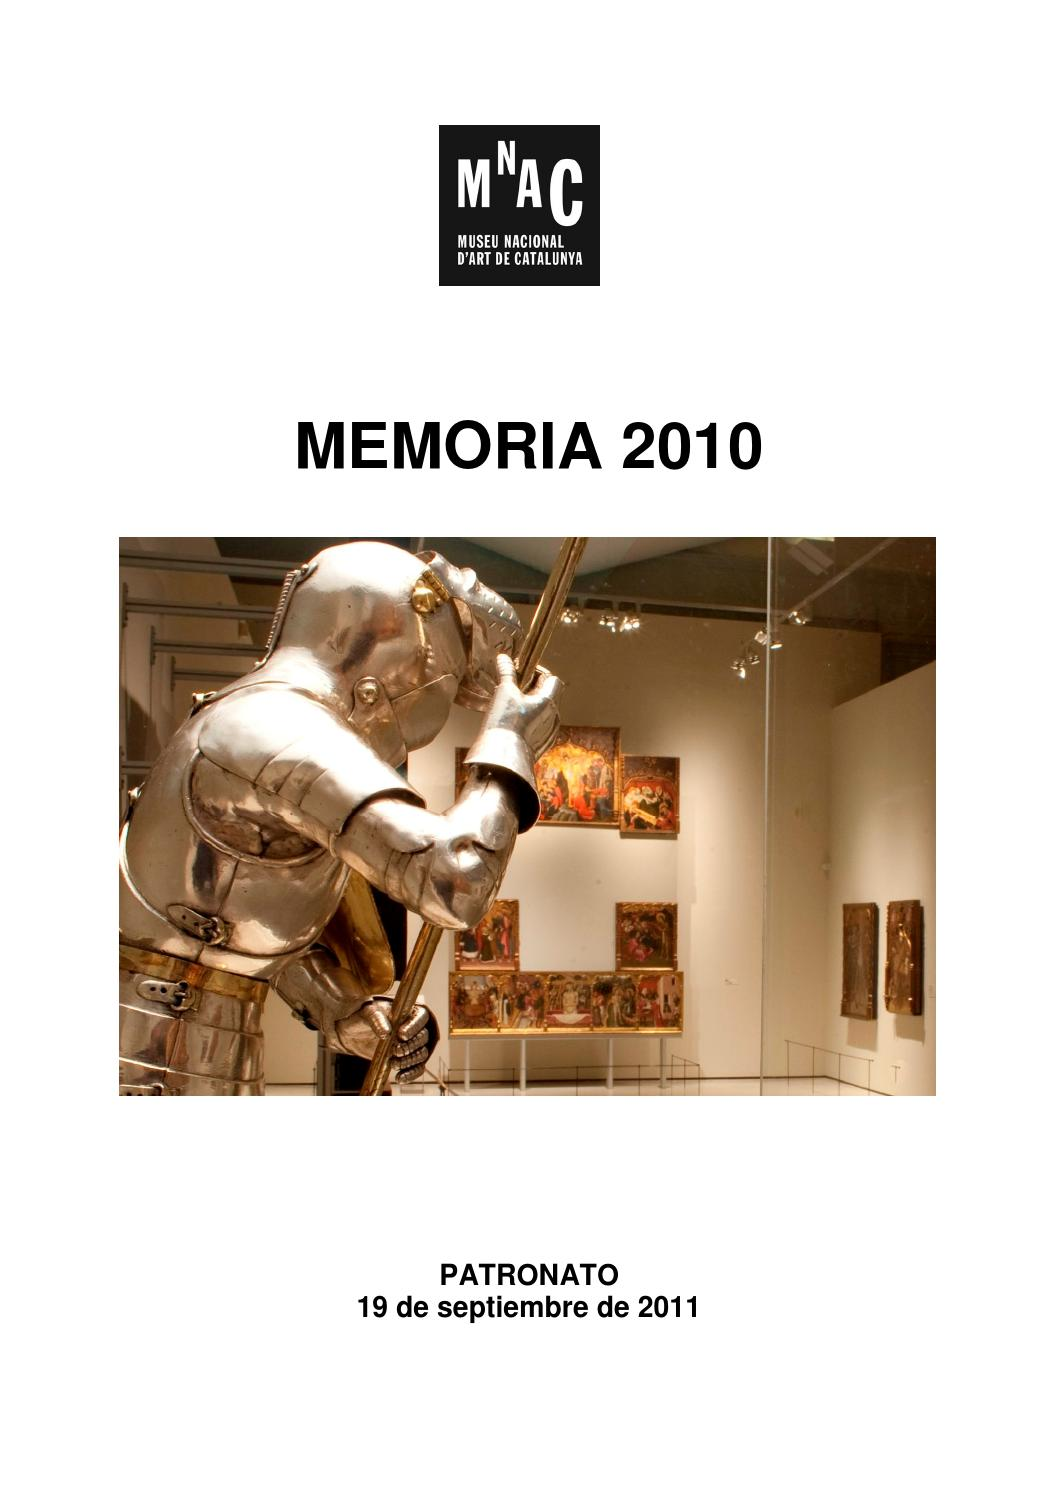 Memoria Museu Nacional 2010 Castellano By Museu Nacional D Art  # Muebles Viuda De Juan Parera